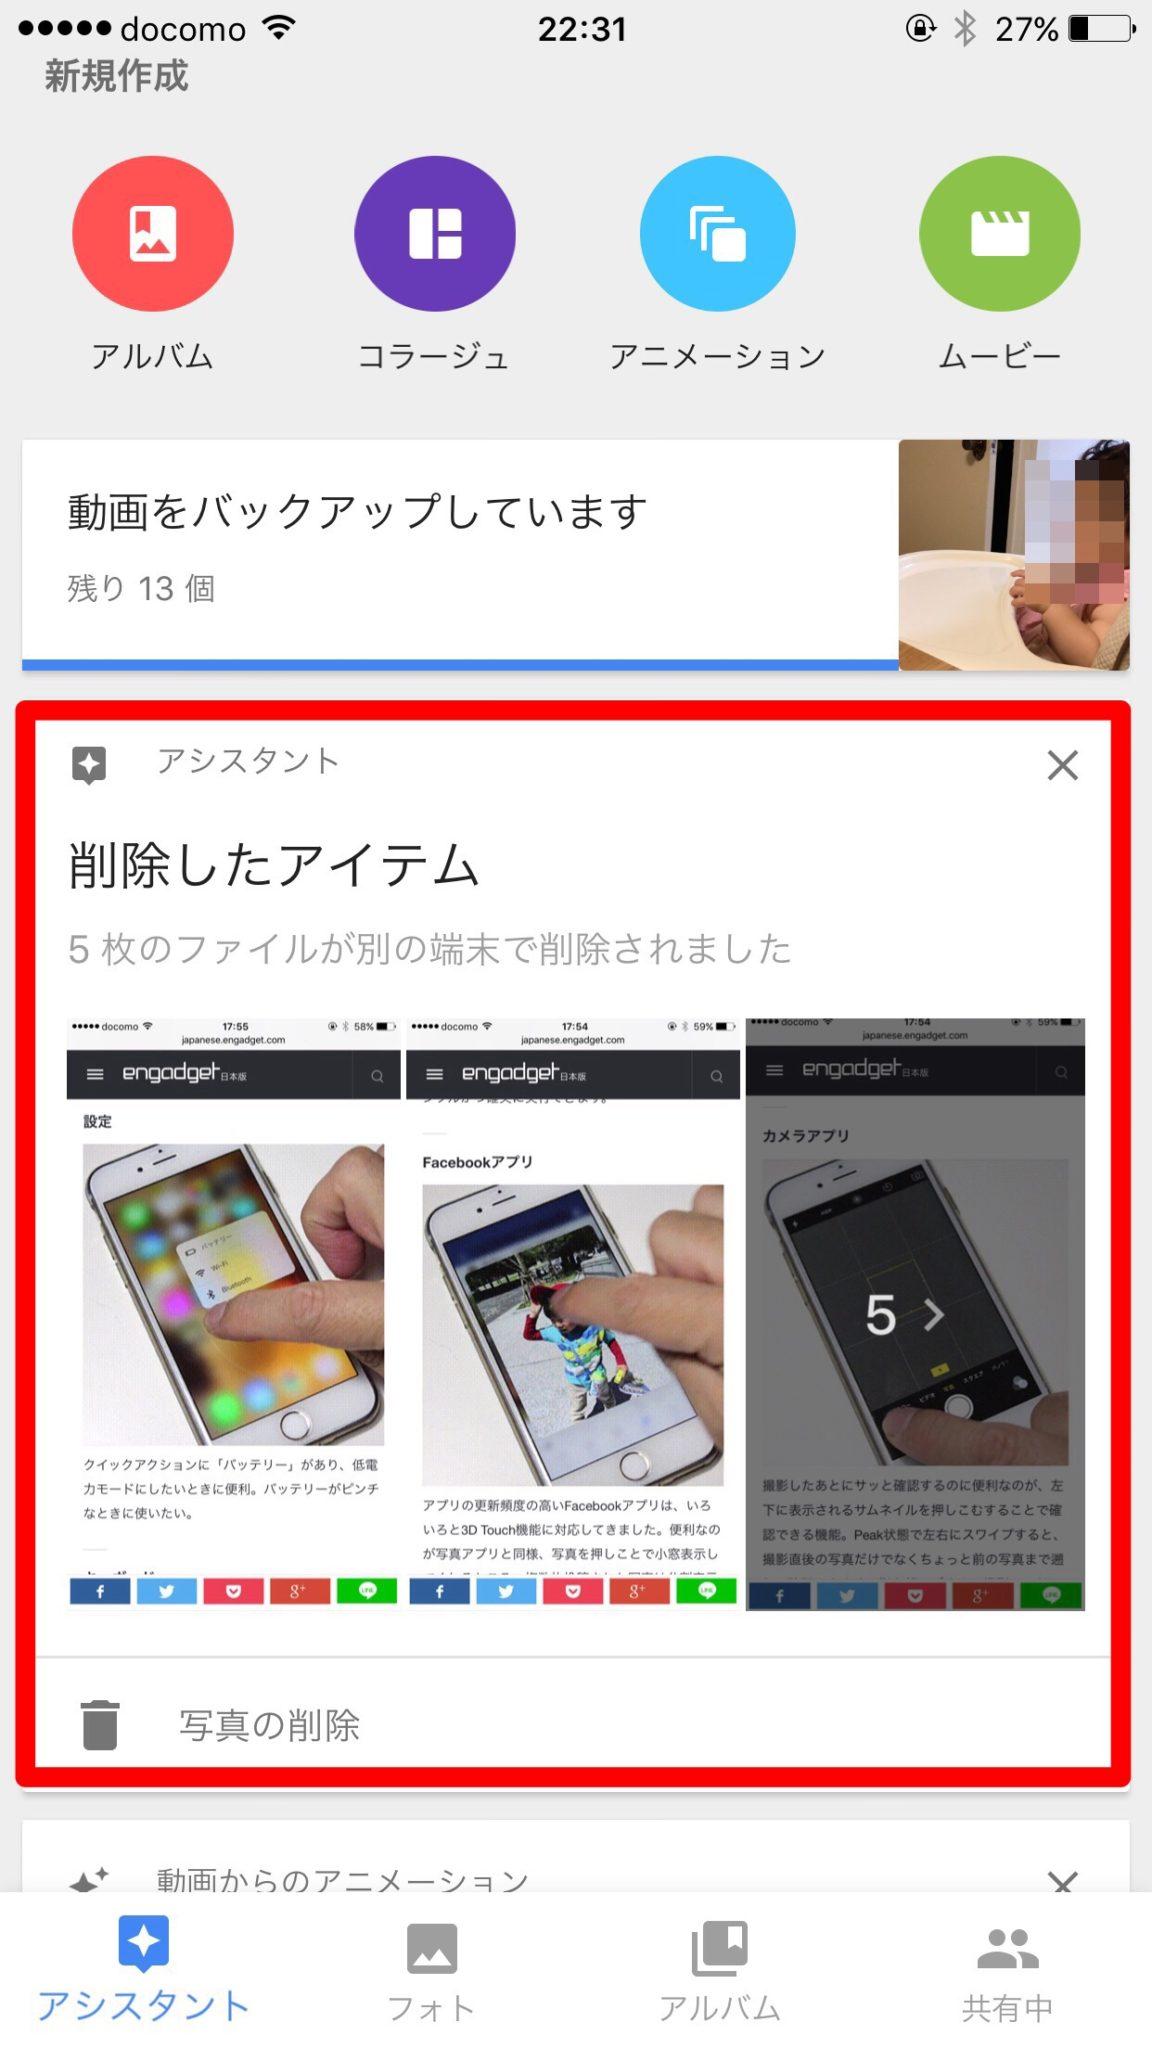 Googleフォトで自動同期中にiPhone、クラウドのどちらかに写真を保存する方法